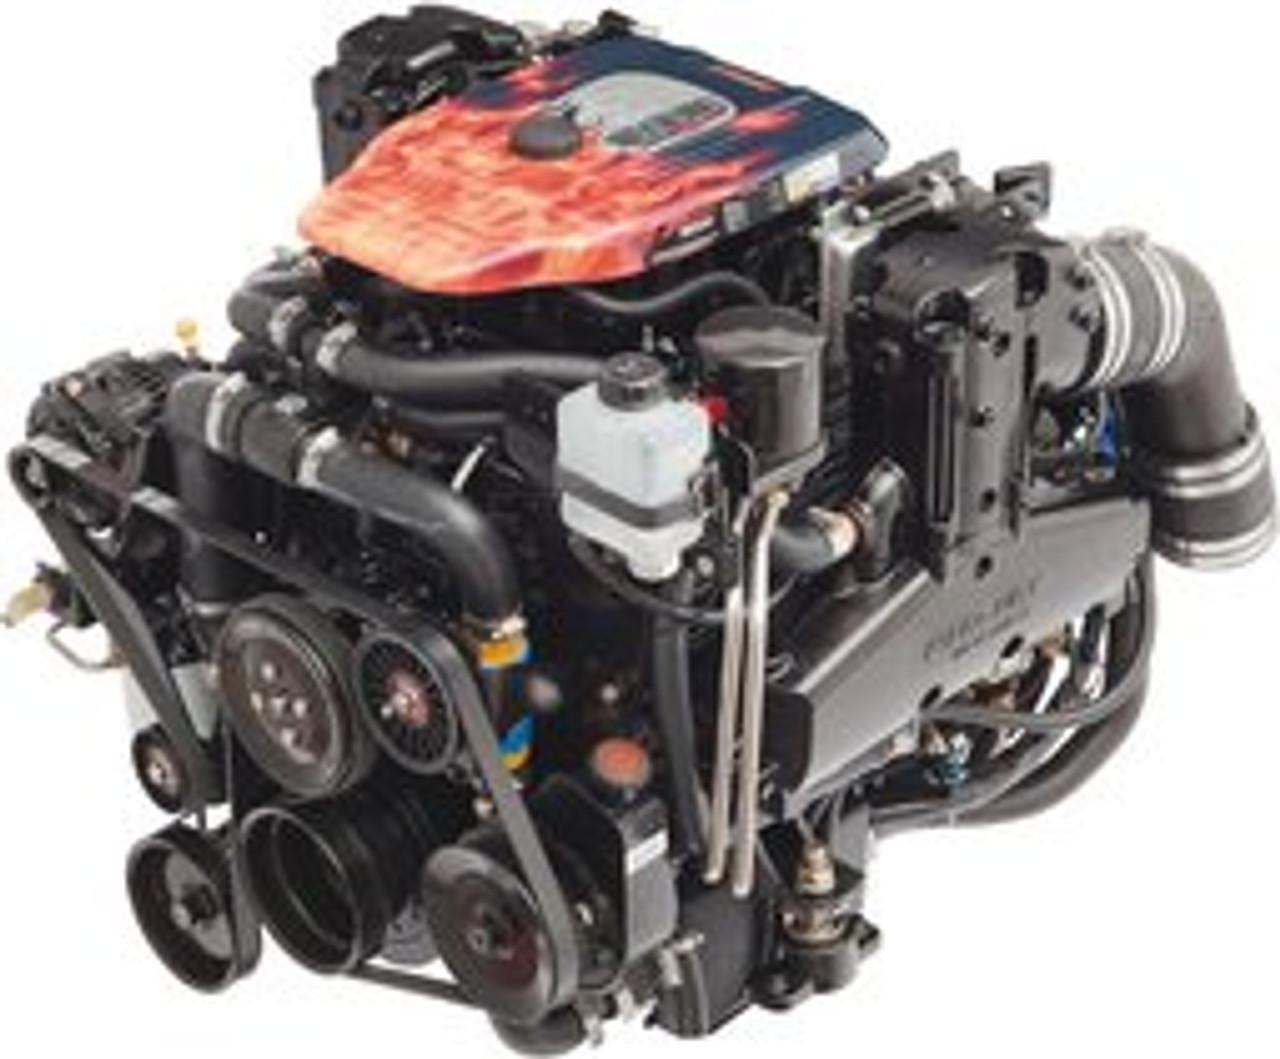 hight resolution of mercruiser plus series 383 mag stroker mpi bravo engine 350 hp 714 865108r80